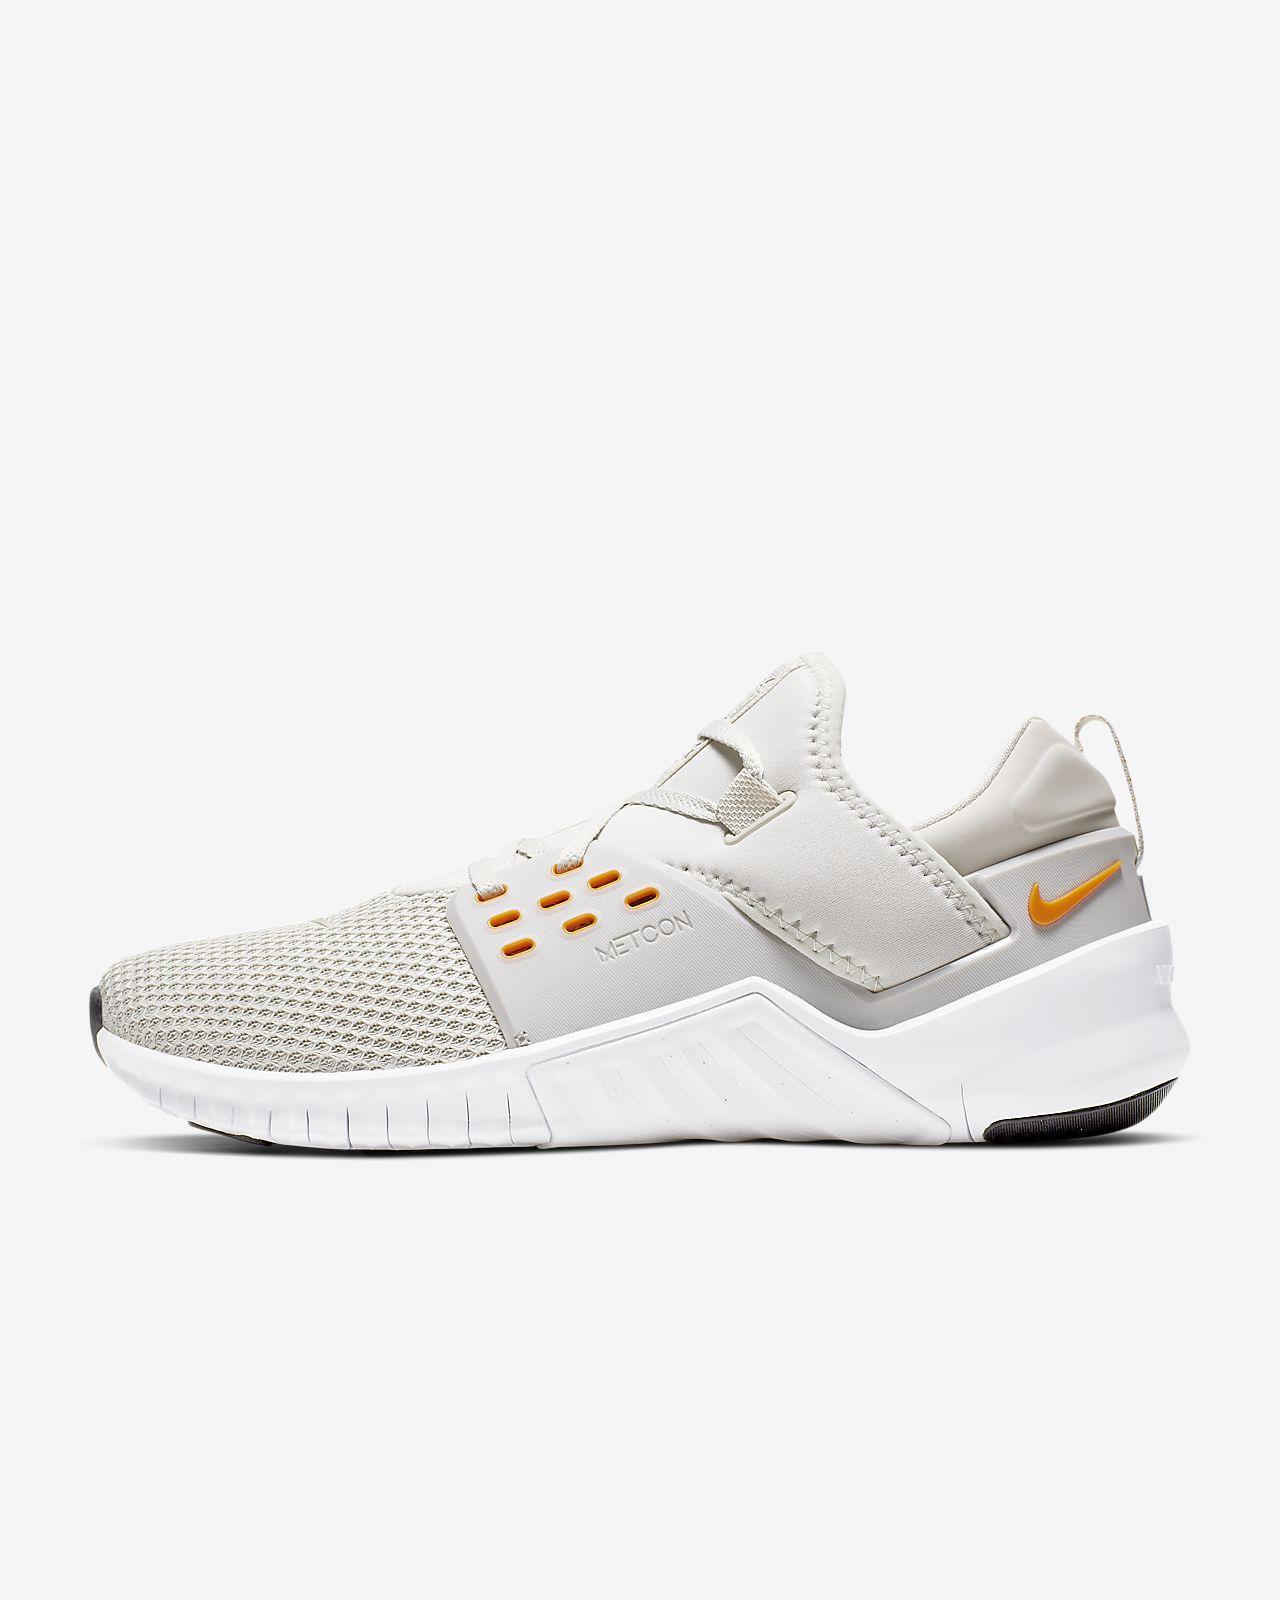 sports shoes cef74 e46ab ... Träningssko Nike Free X Metcon 2 för män